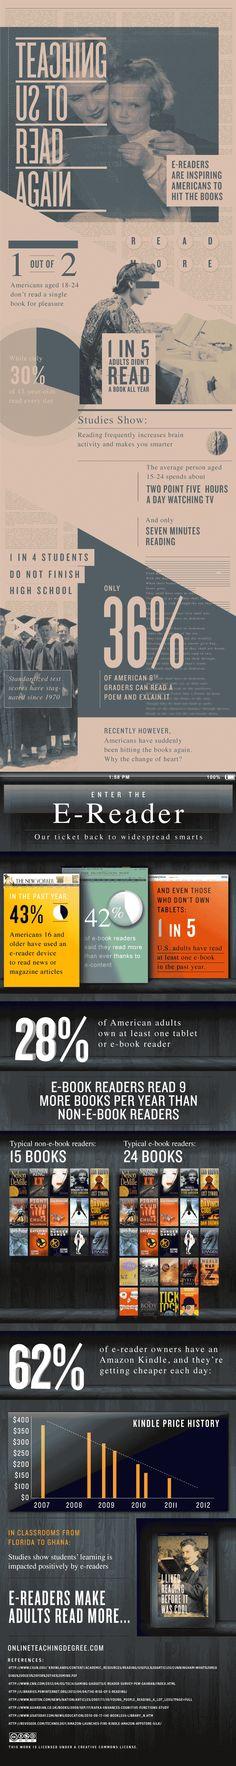 E-Readers:  Teaching Us to Read Again